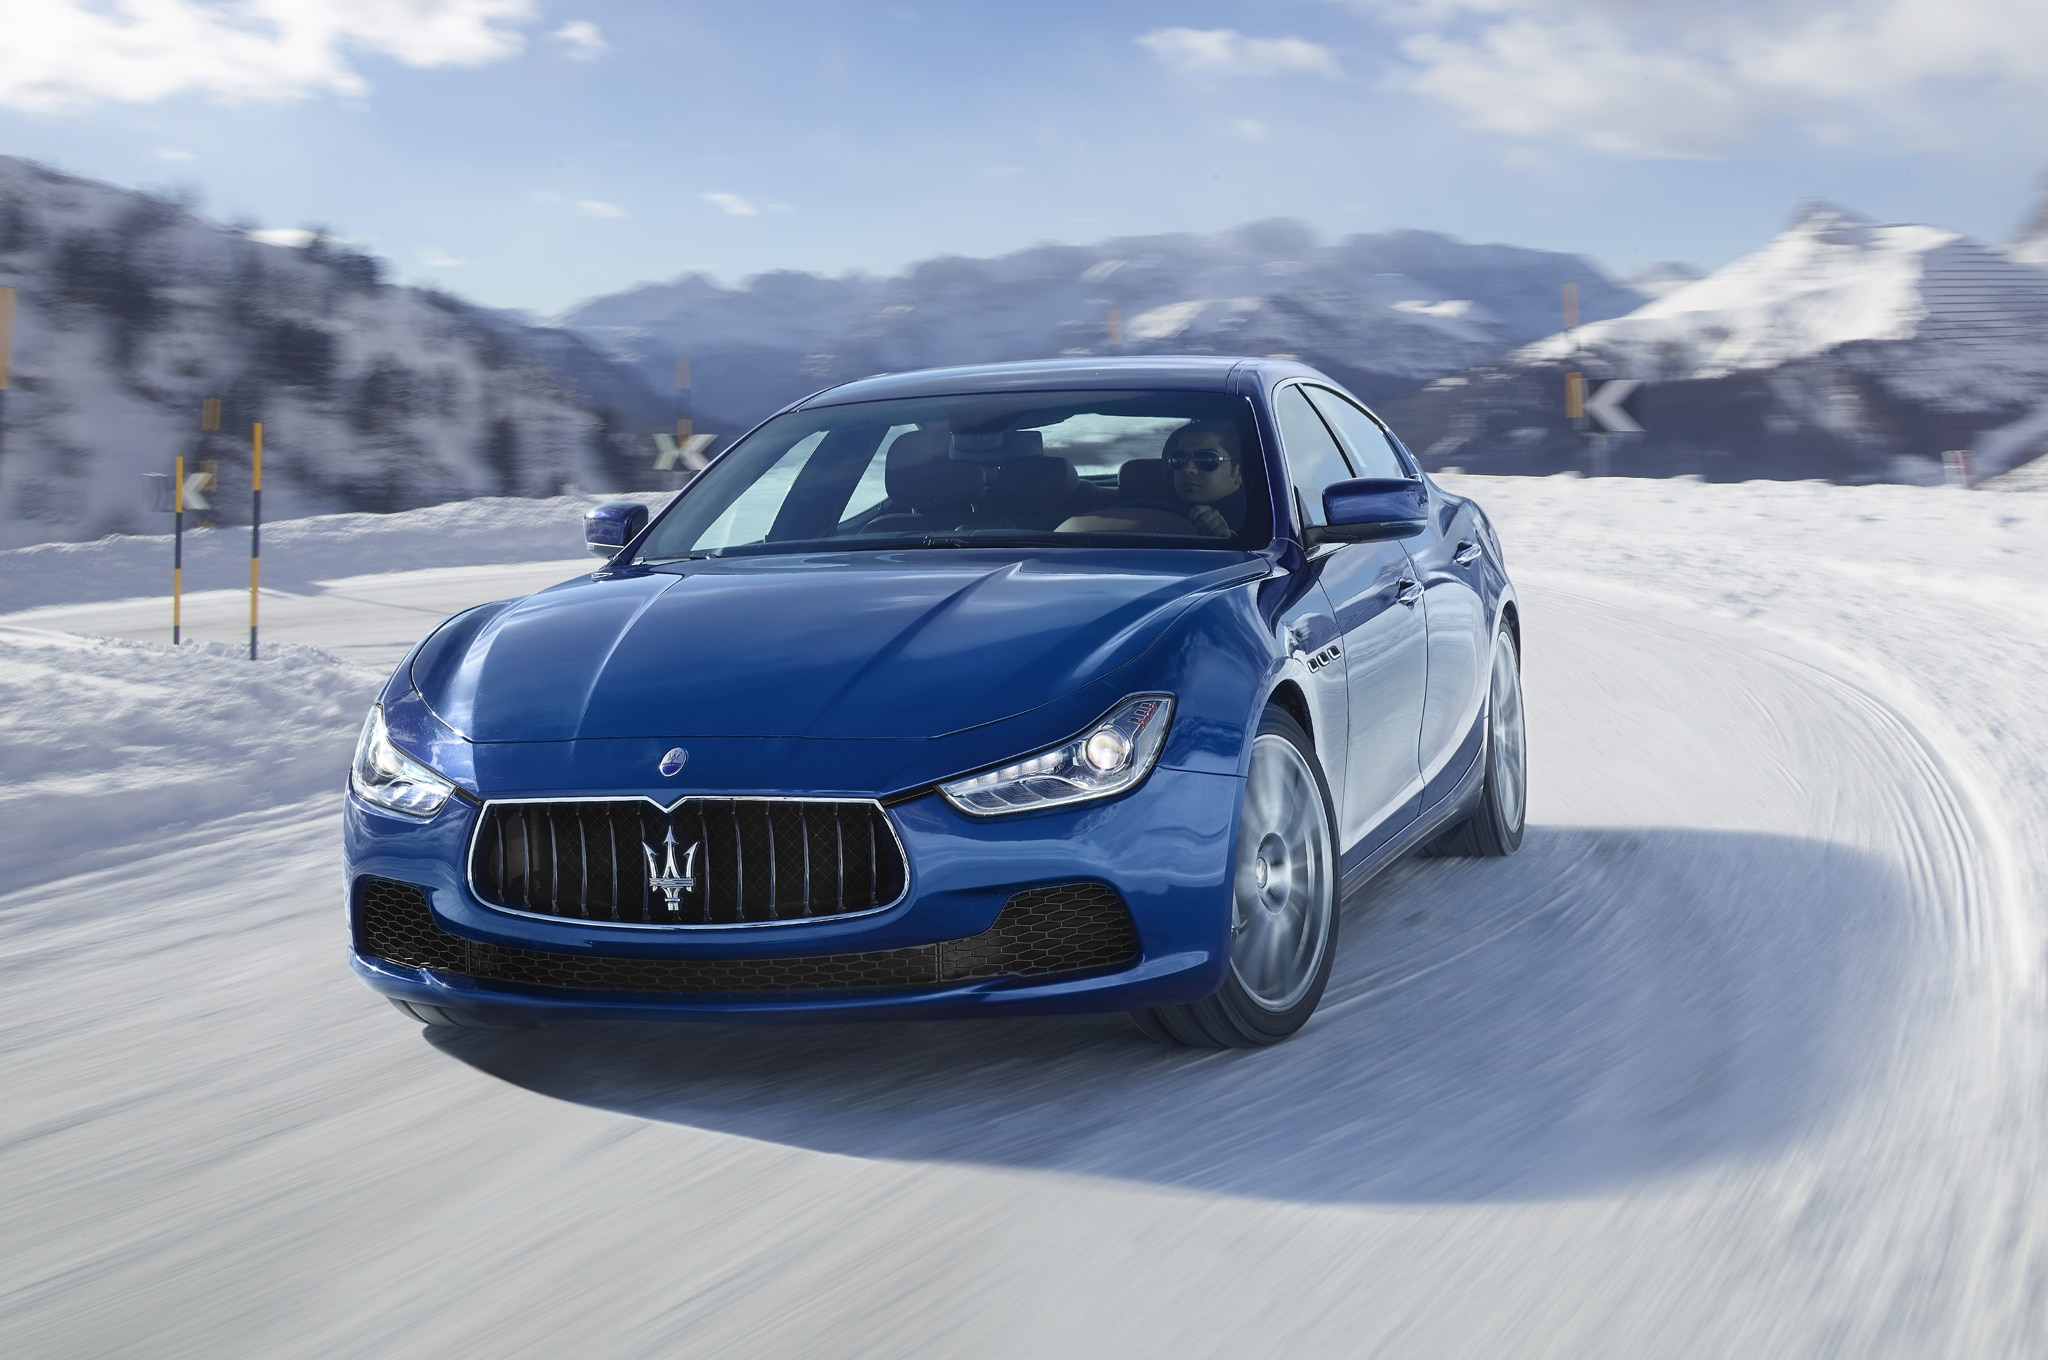 2014 Maserati Ghibli Priced At 66 850 Rated Iihs 2013 Top Safety Pick